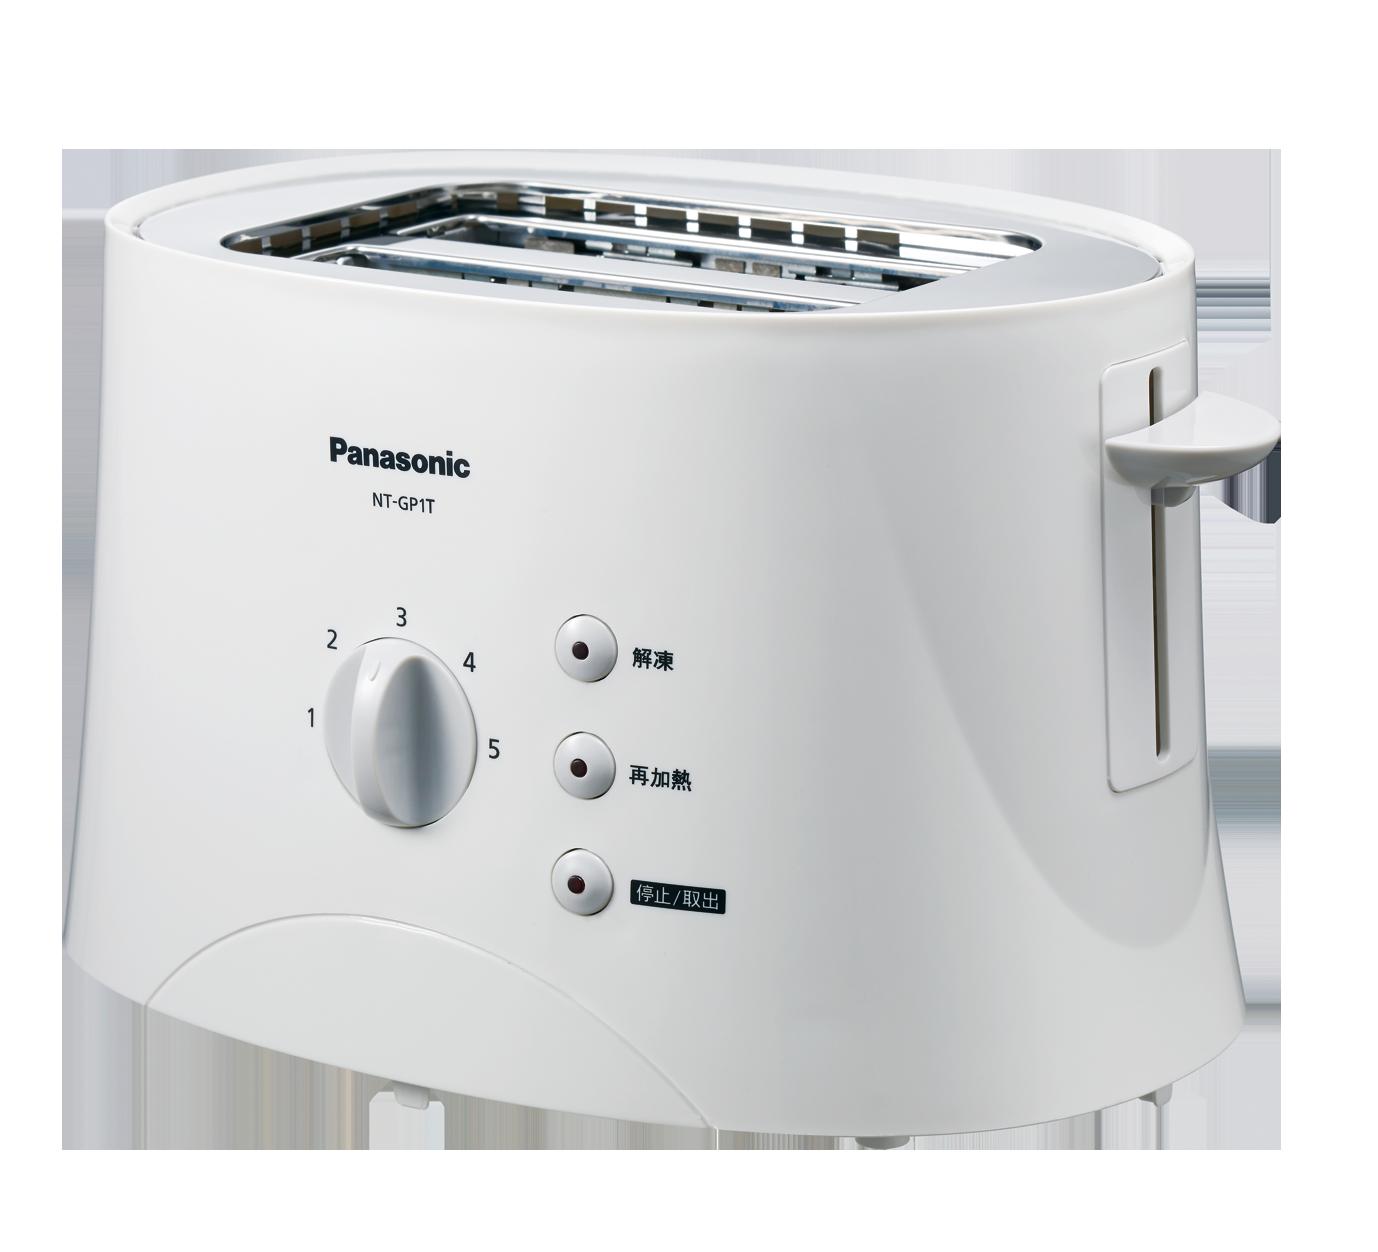 Panasonic NT-GP1T 五段調節烤麵包機